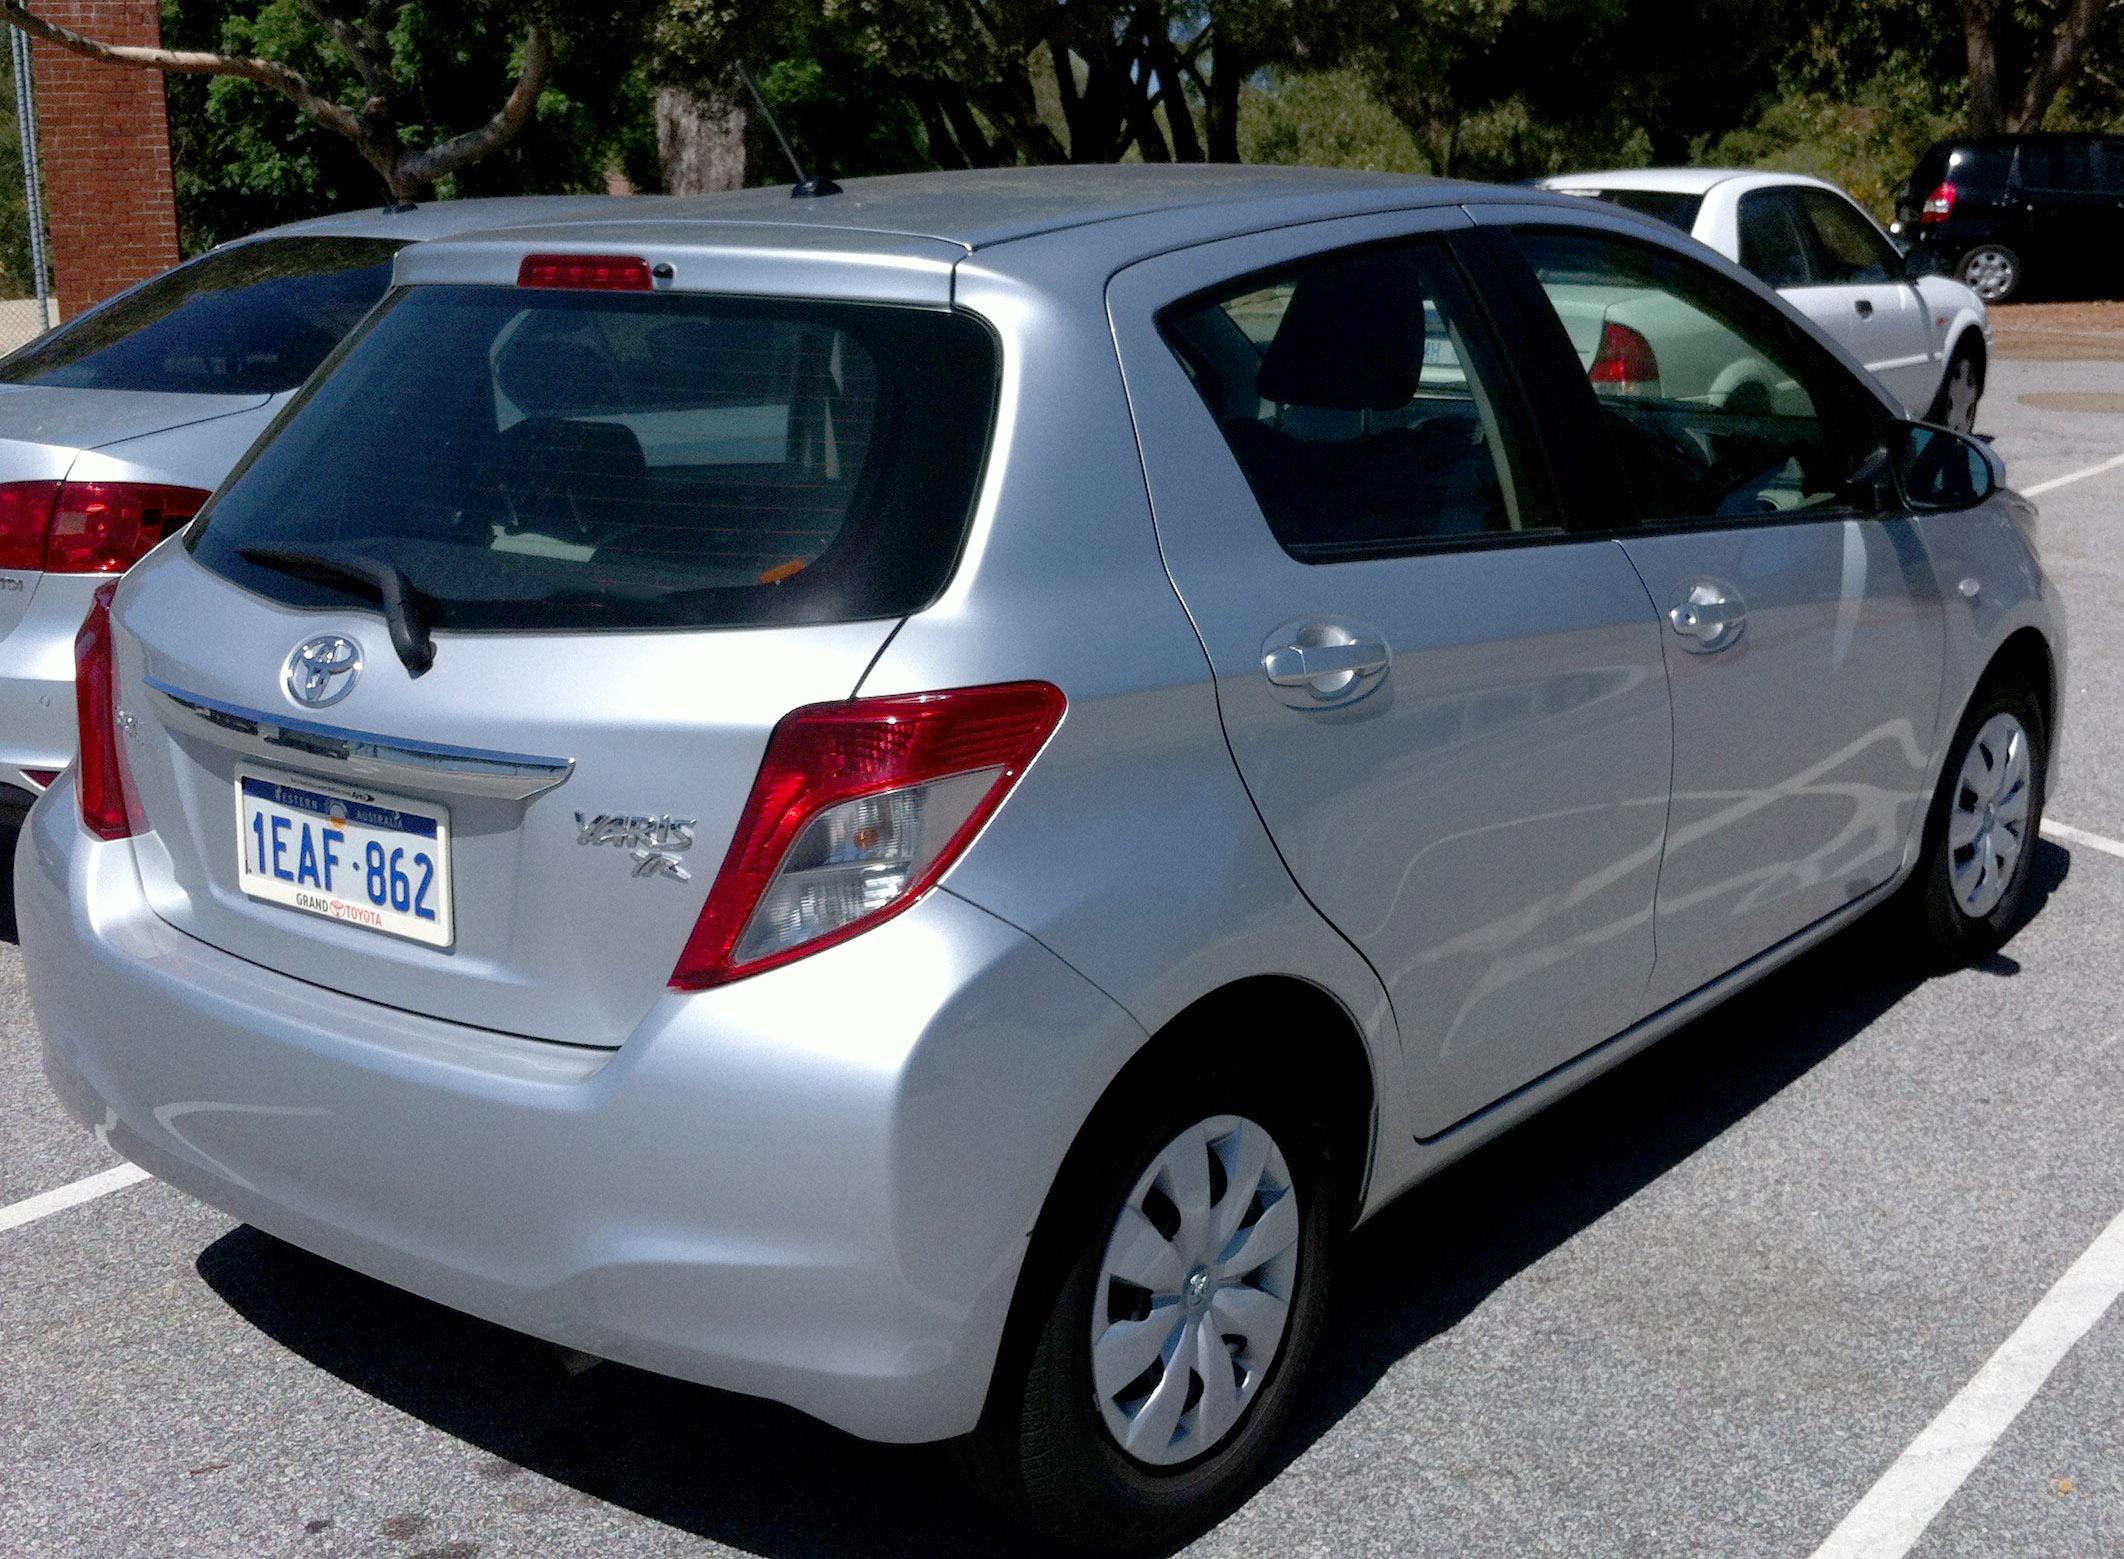 Kelebihan Kekurangan Toyota Yaris 2012 Murah Berkualitas